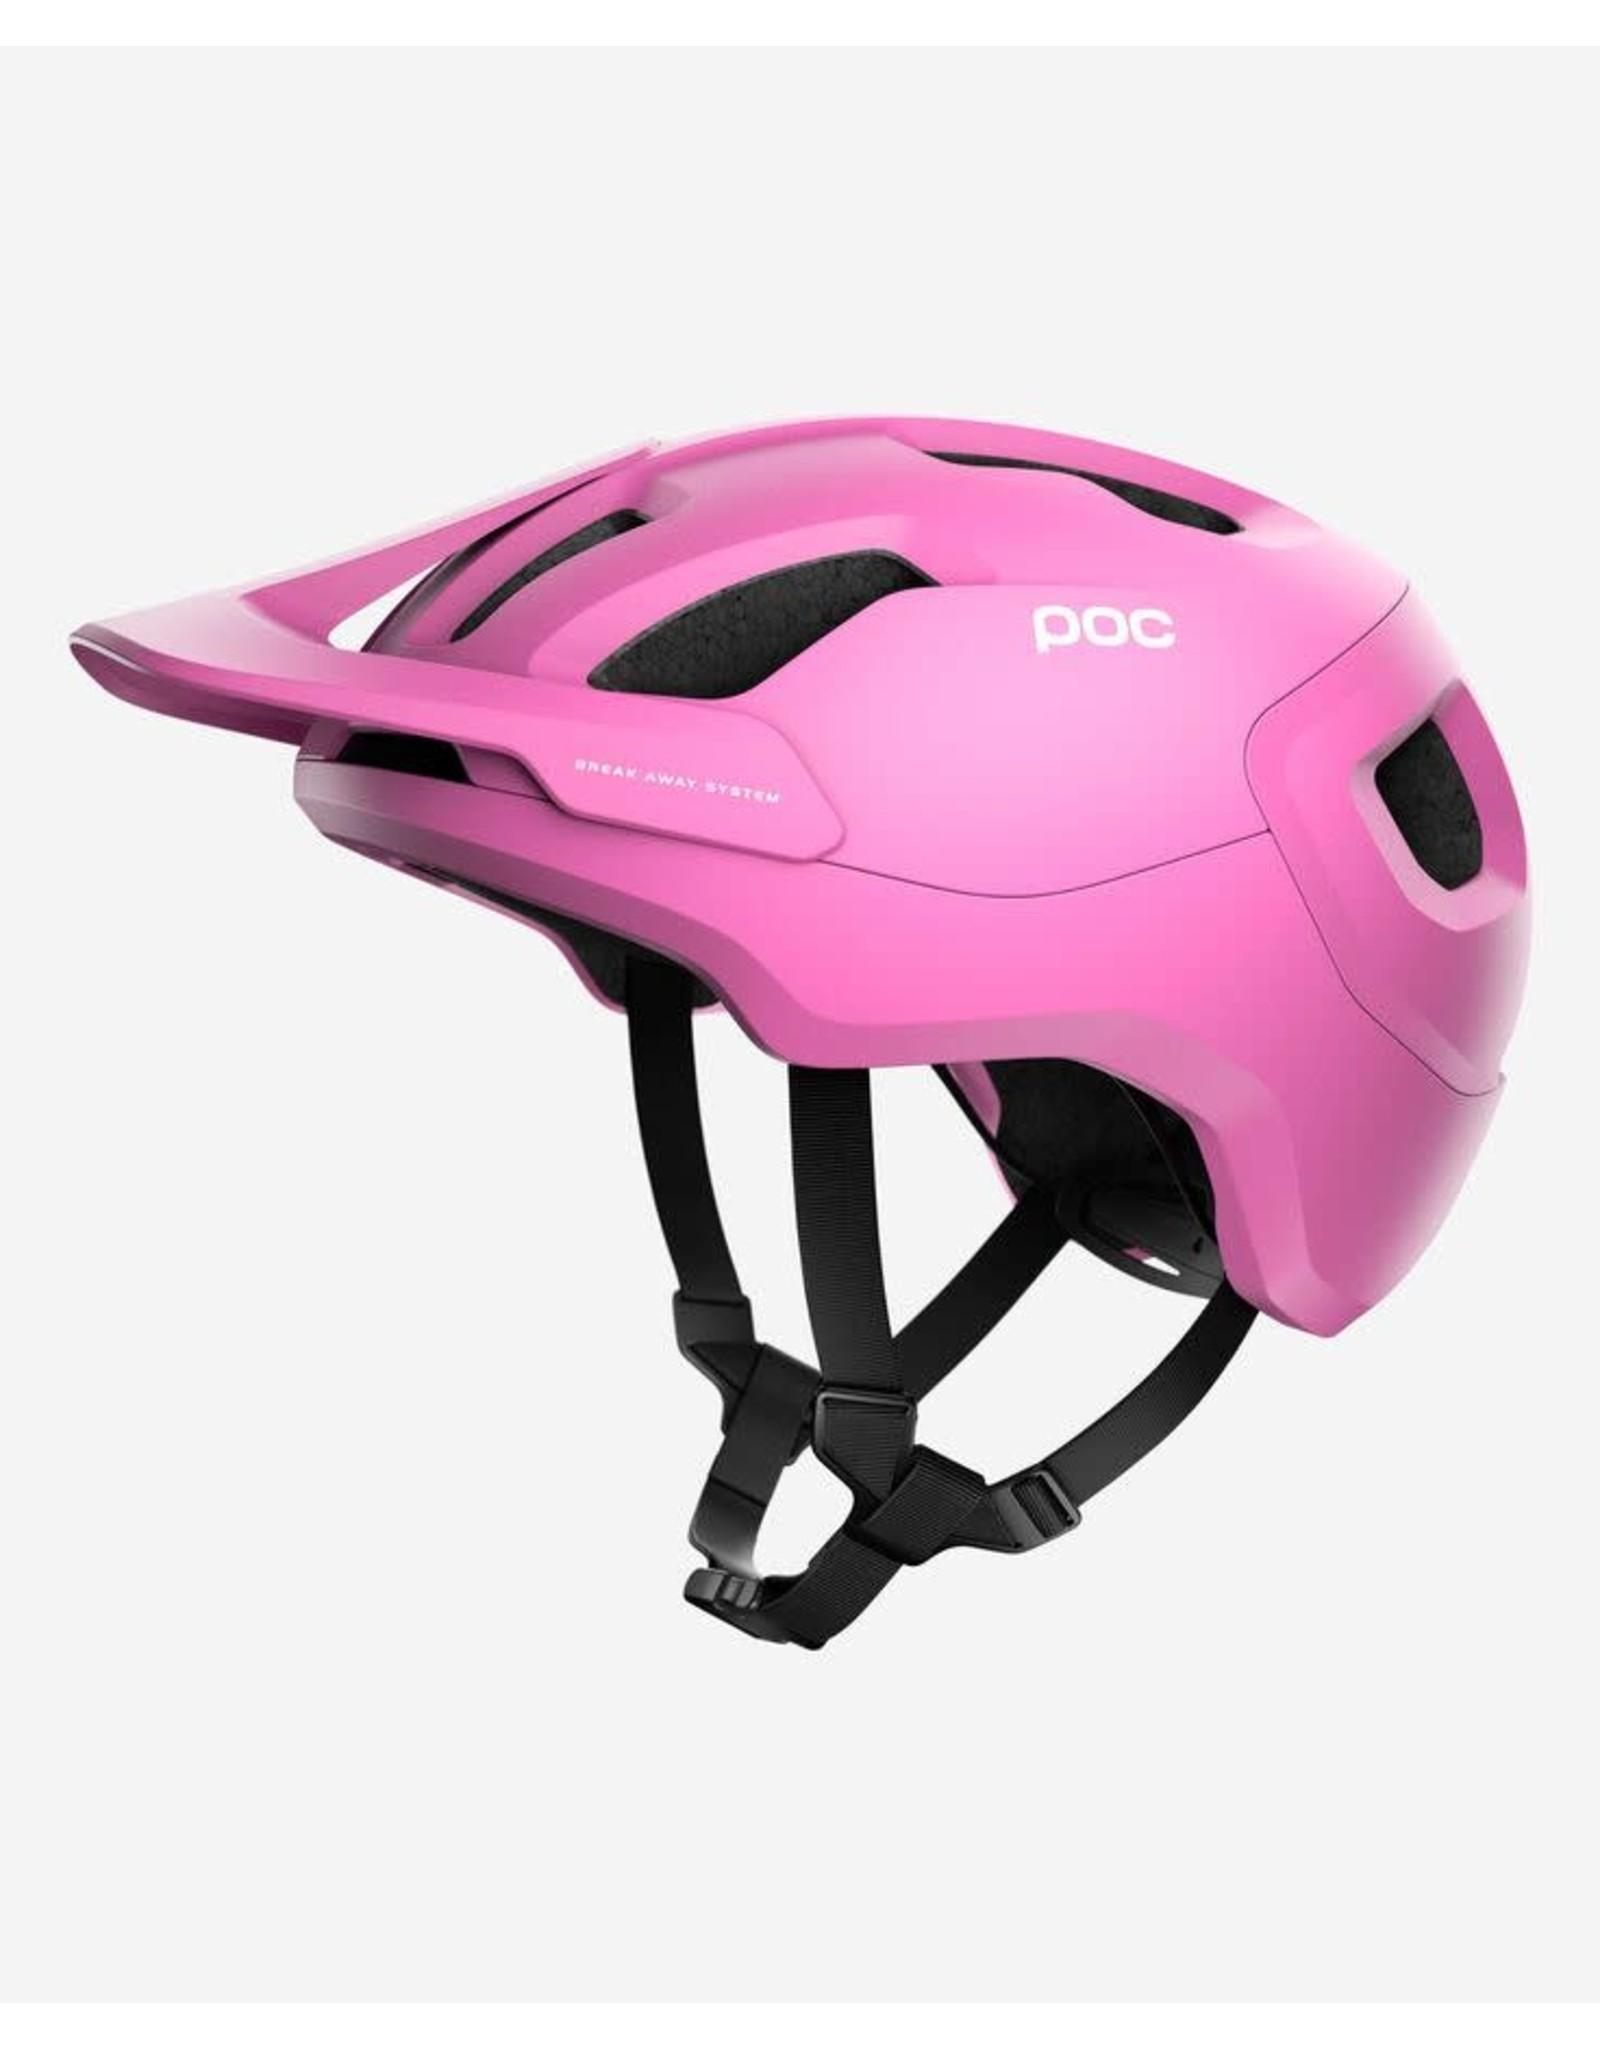 POC Helmet POC Axion Spin